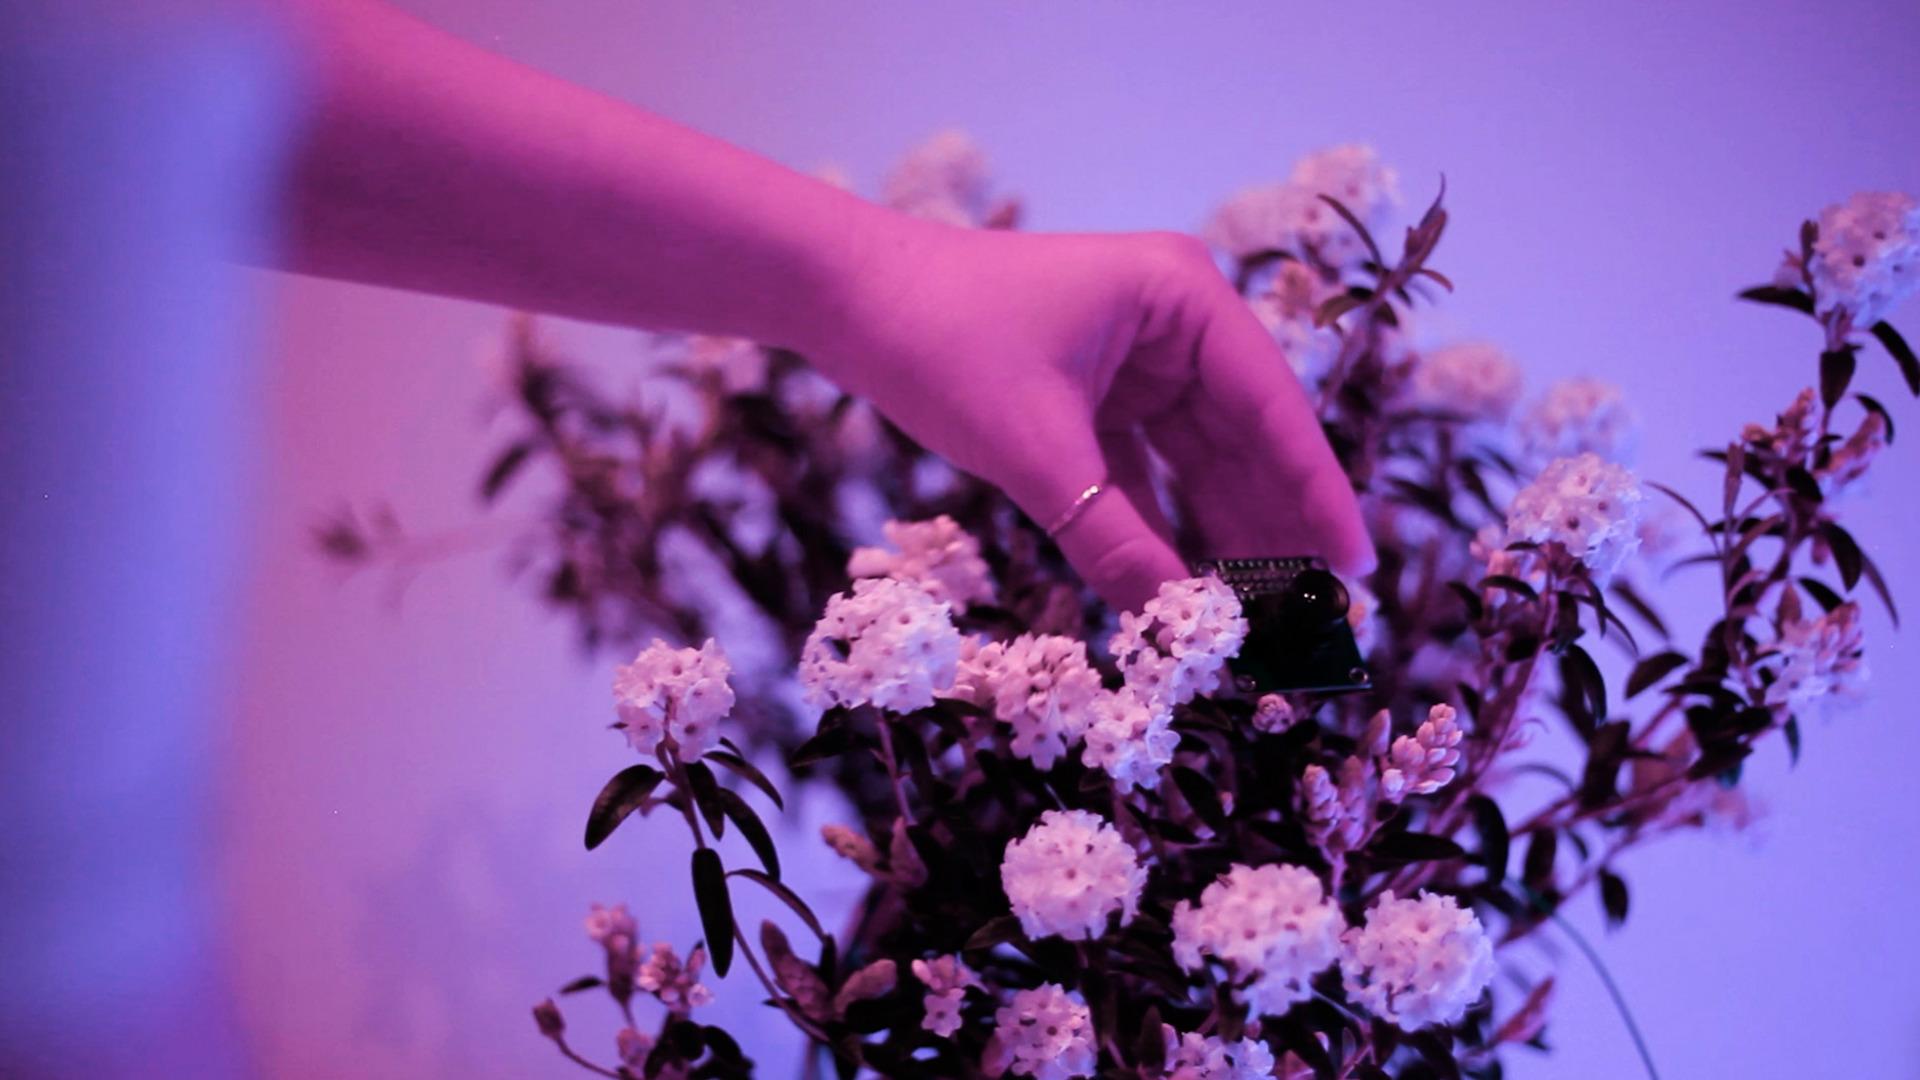 Plant-machine experimentation